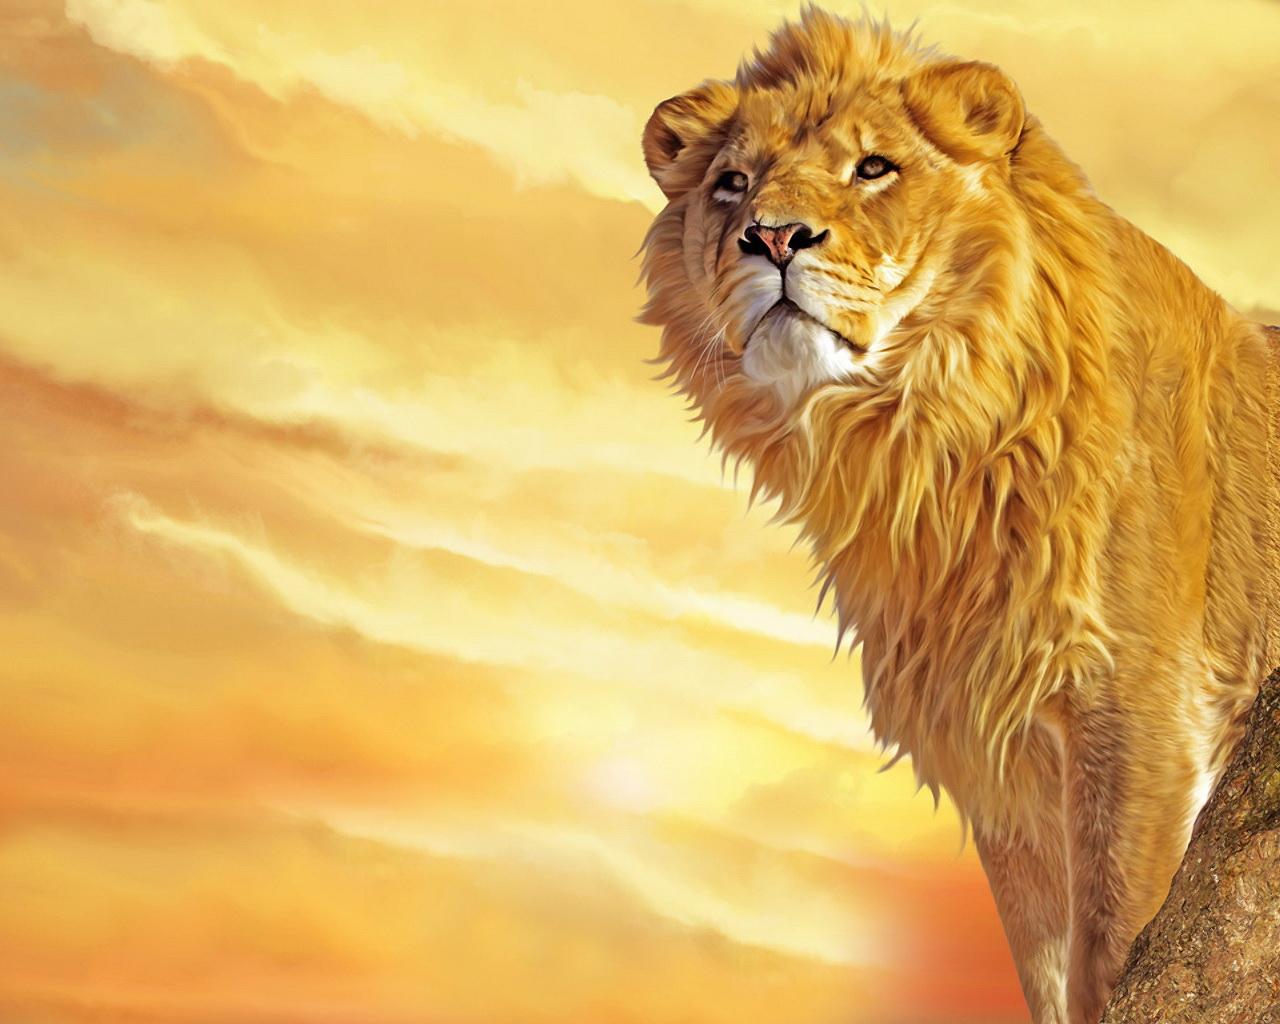 http://1.bp.blogspot.com/-rX-rYkQsJaE/T24Sm8sF8pI/AAAAAAAACRM/REh9q_s-zwU/s1600/lion-wallpaper-1.jpg